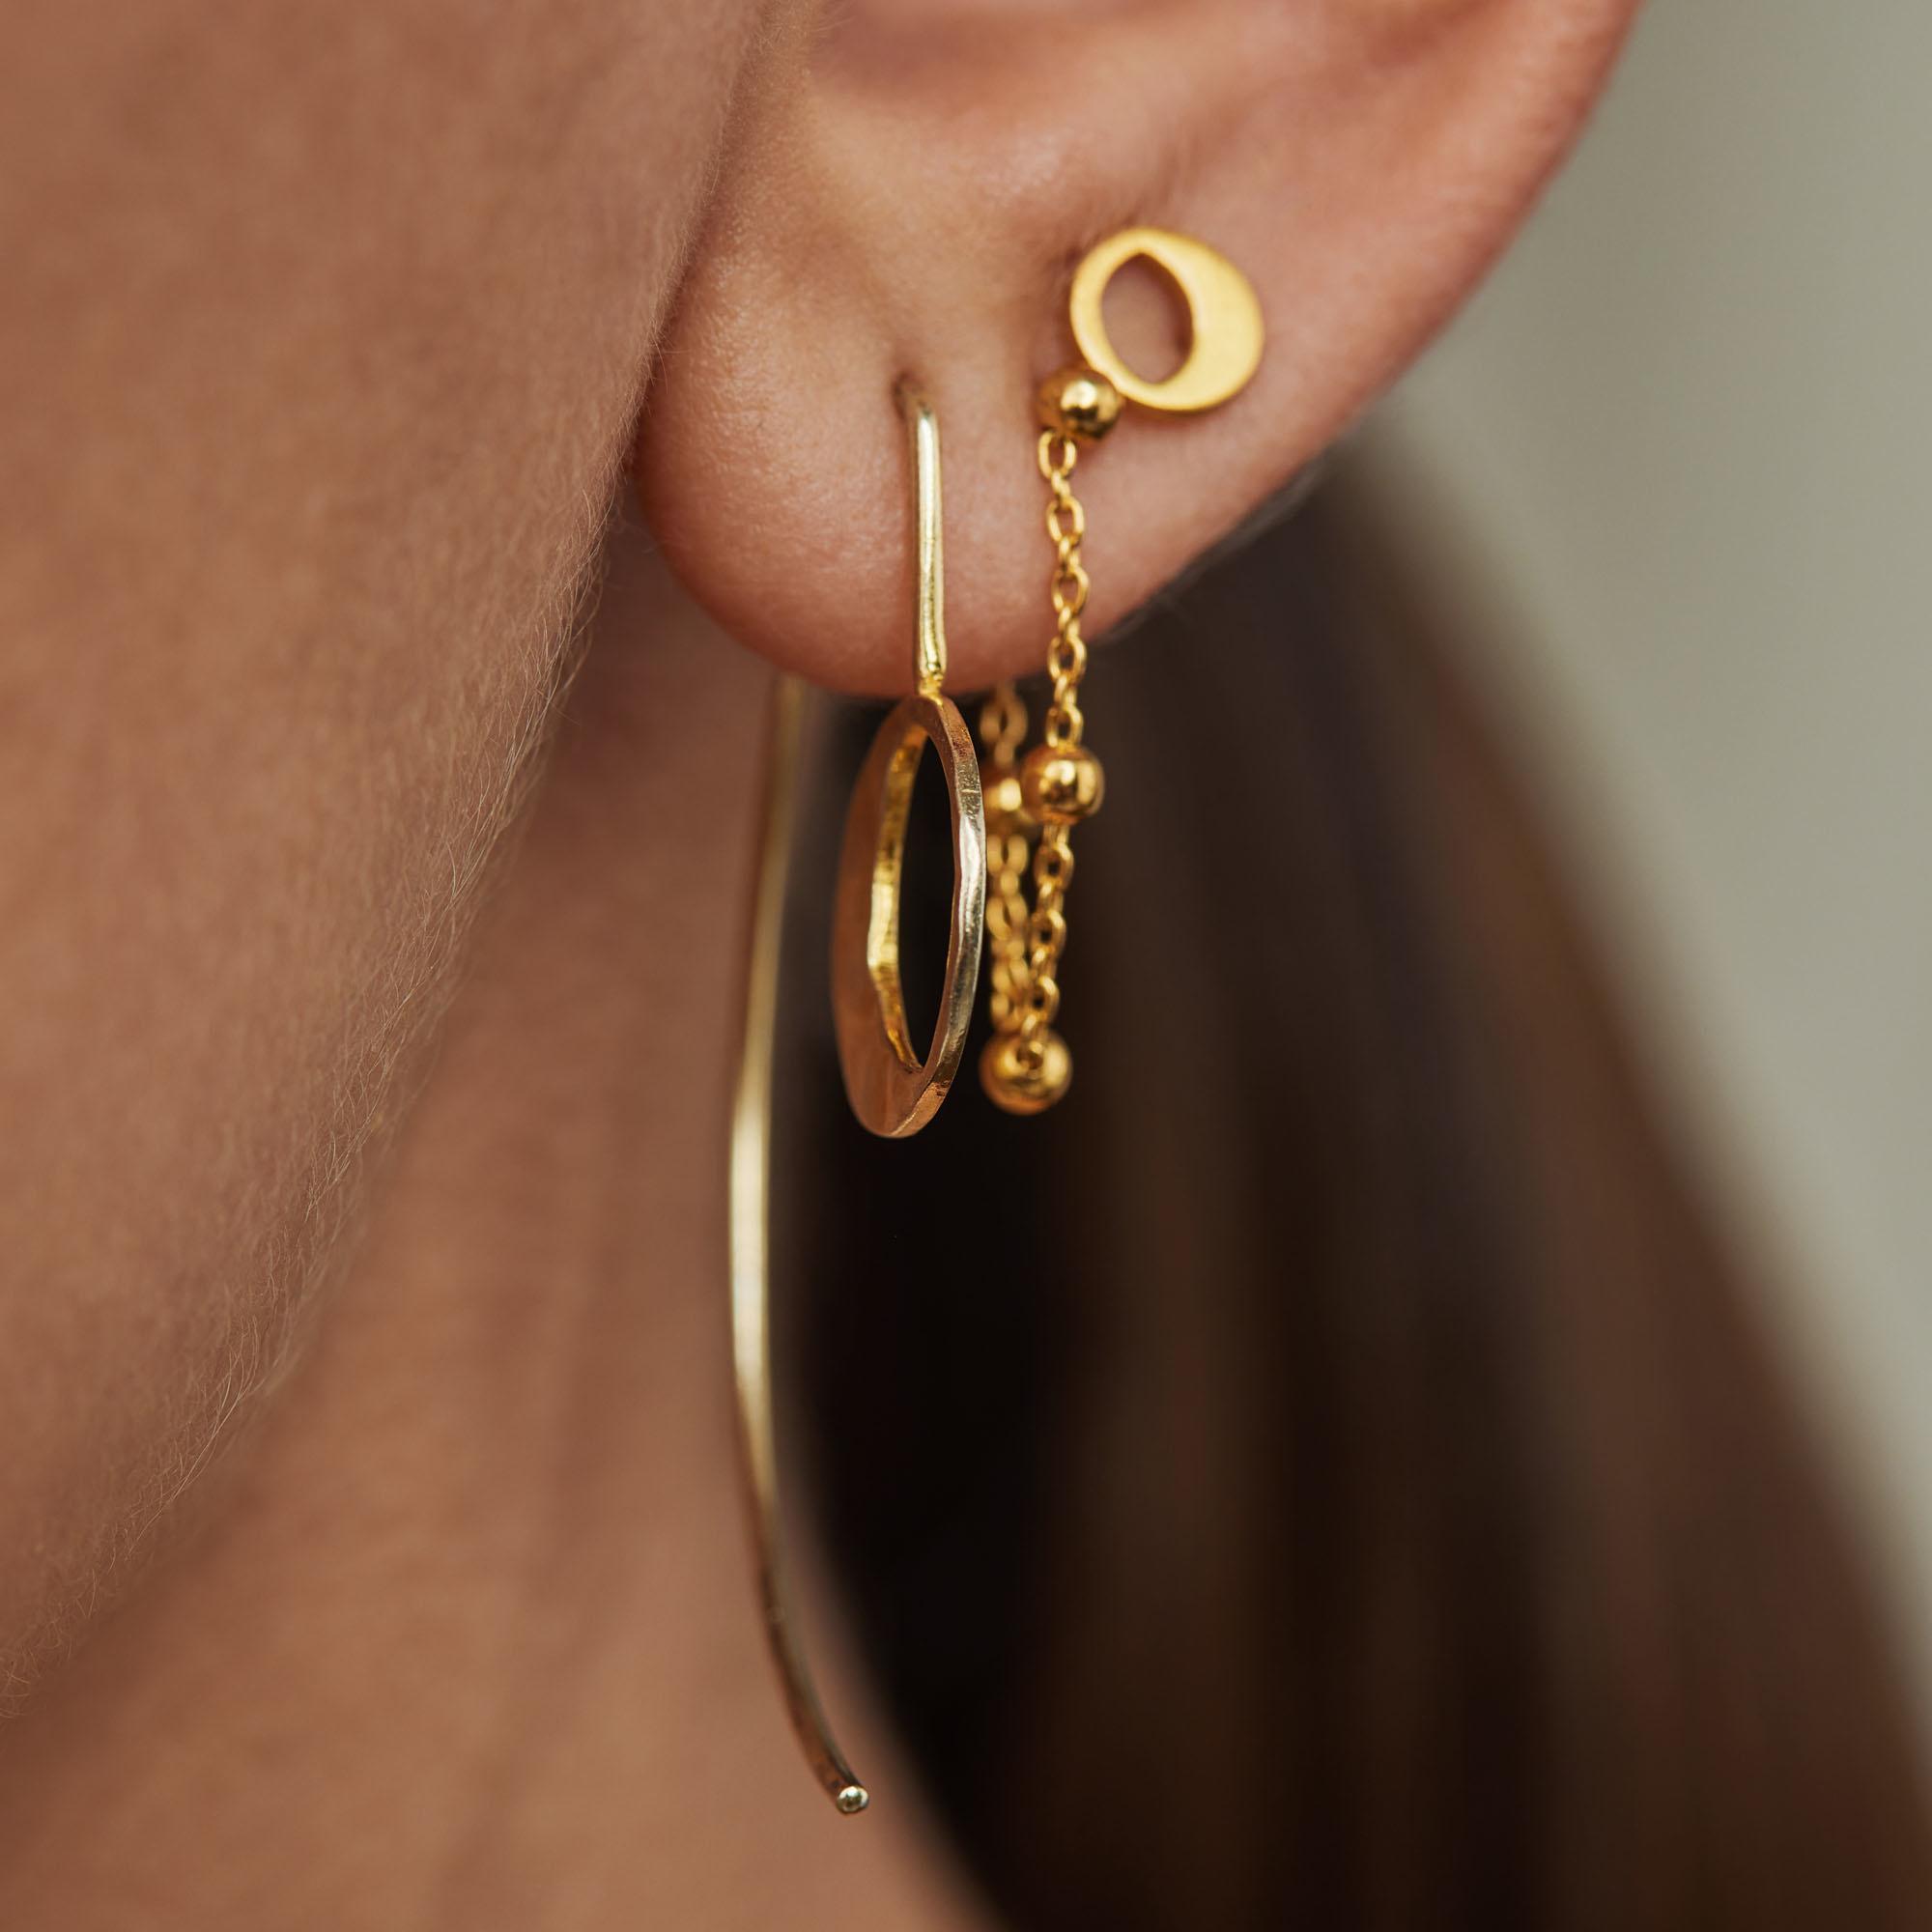 Violet Hamden Luna pendentifs d'oreille couleur or en argent sterling 925